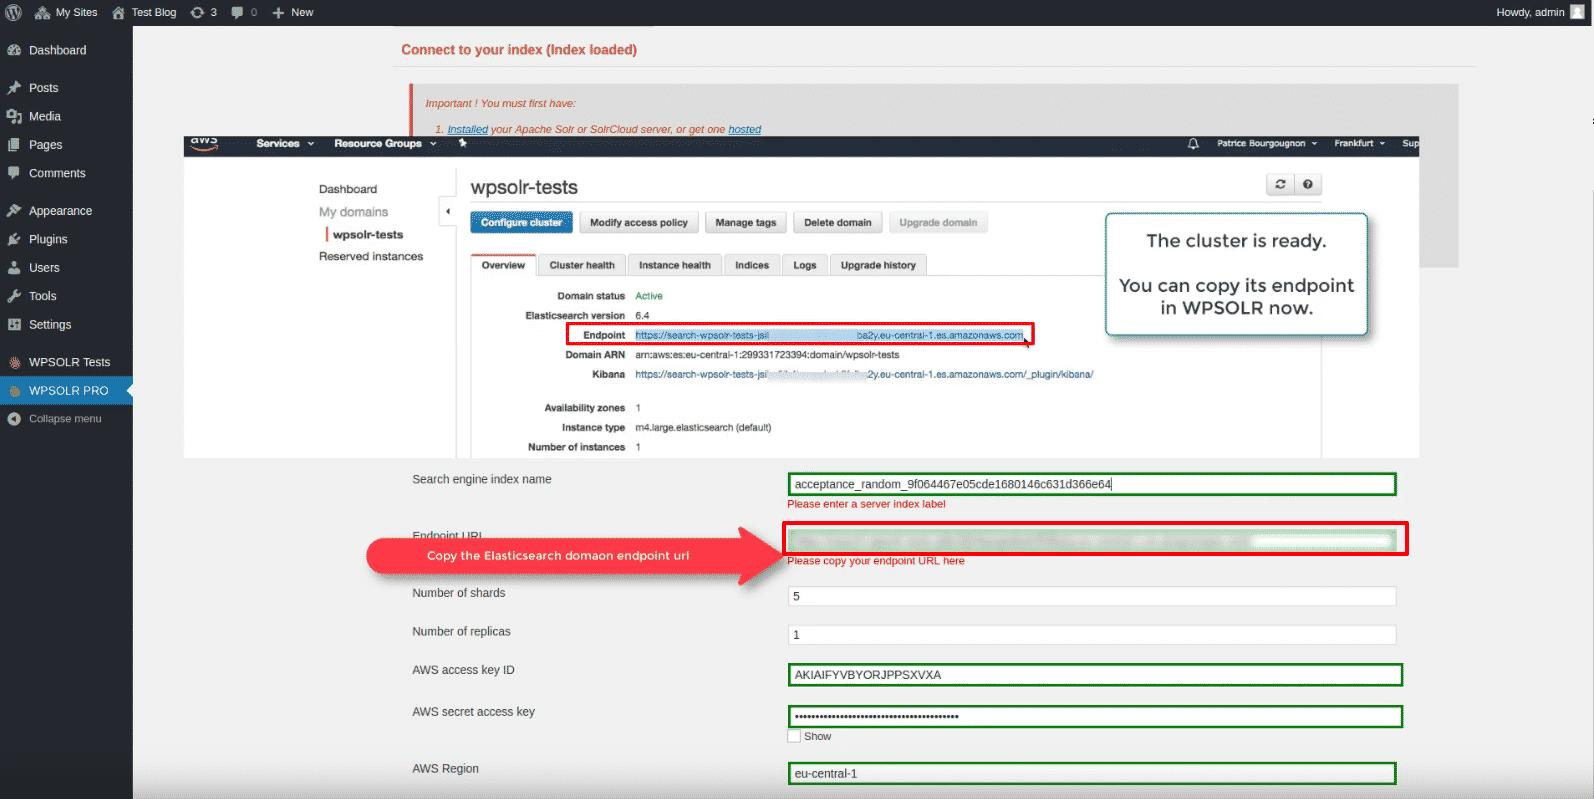 WPSOLR Amazon index: paste Amazon domain endpoint url